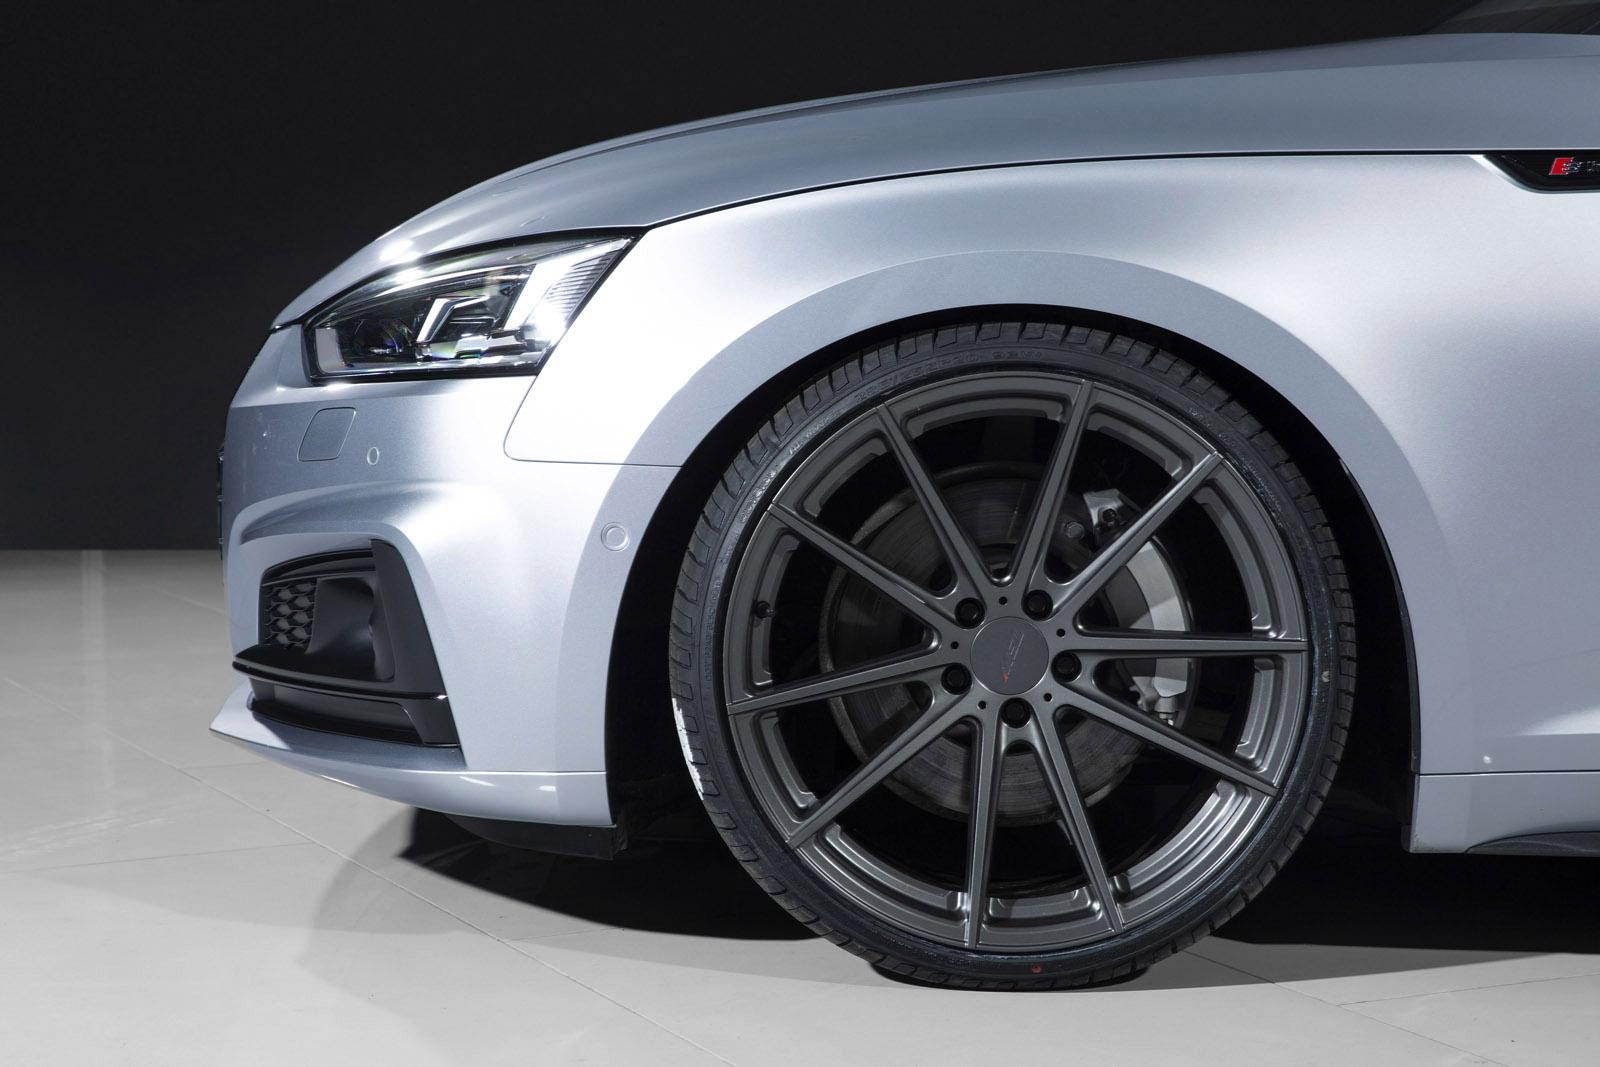 Audi_A5_07.jpg